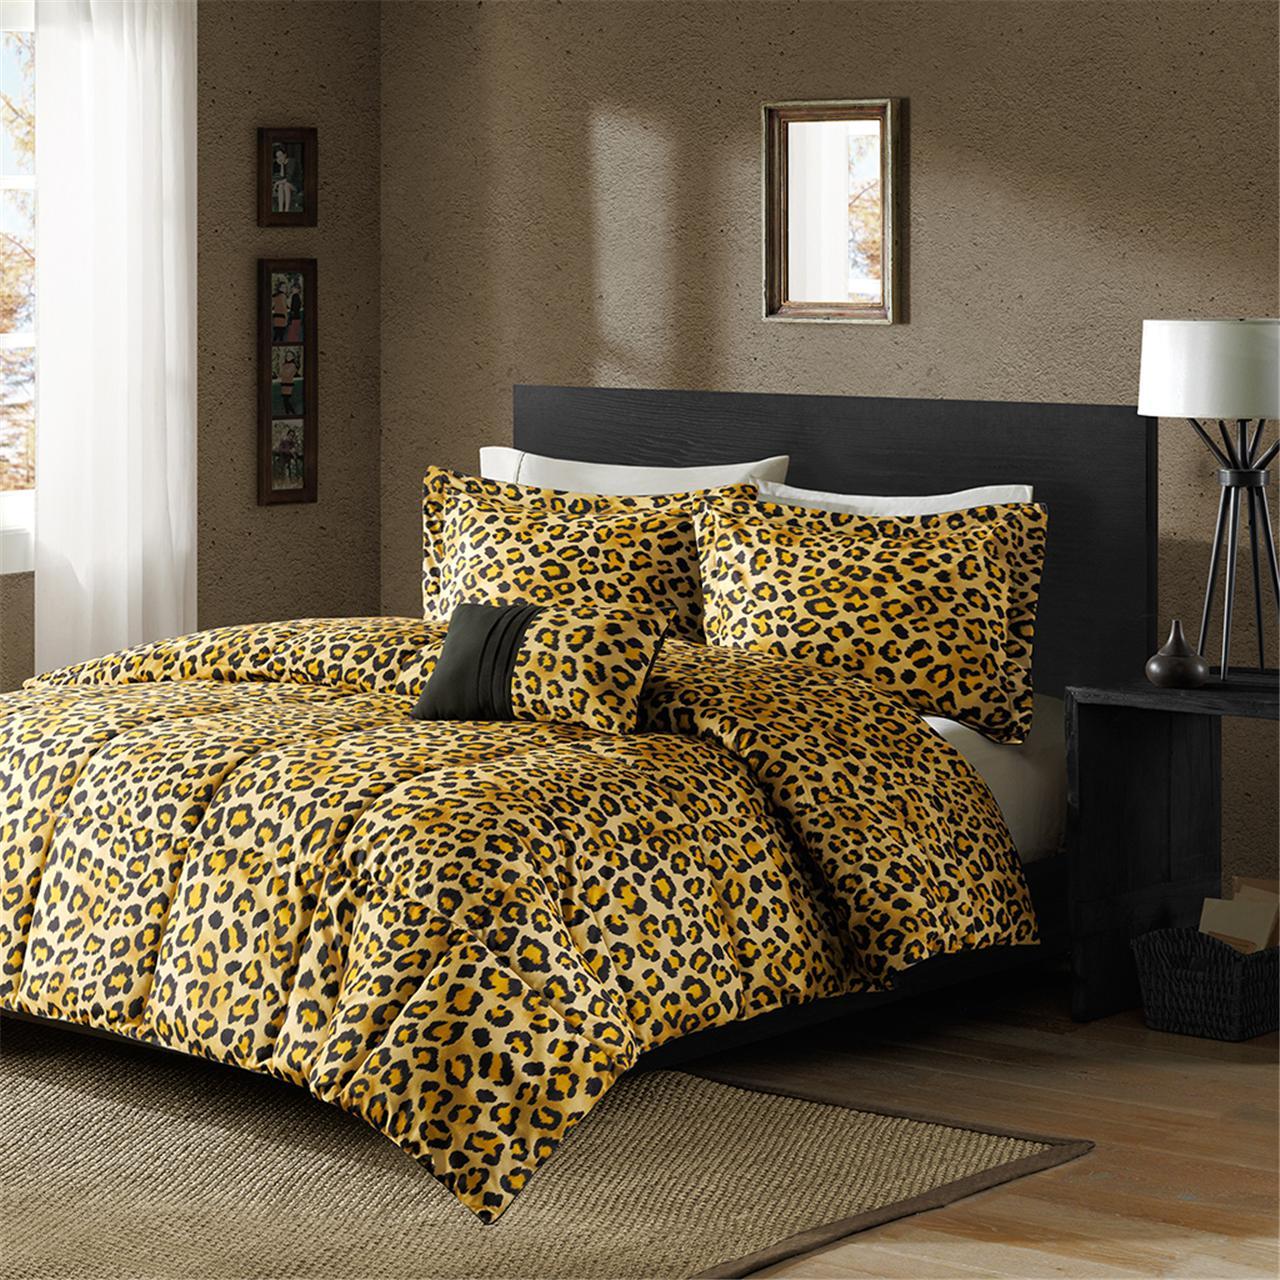 cheetah print bedroom photo - 3